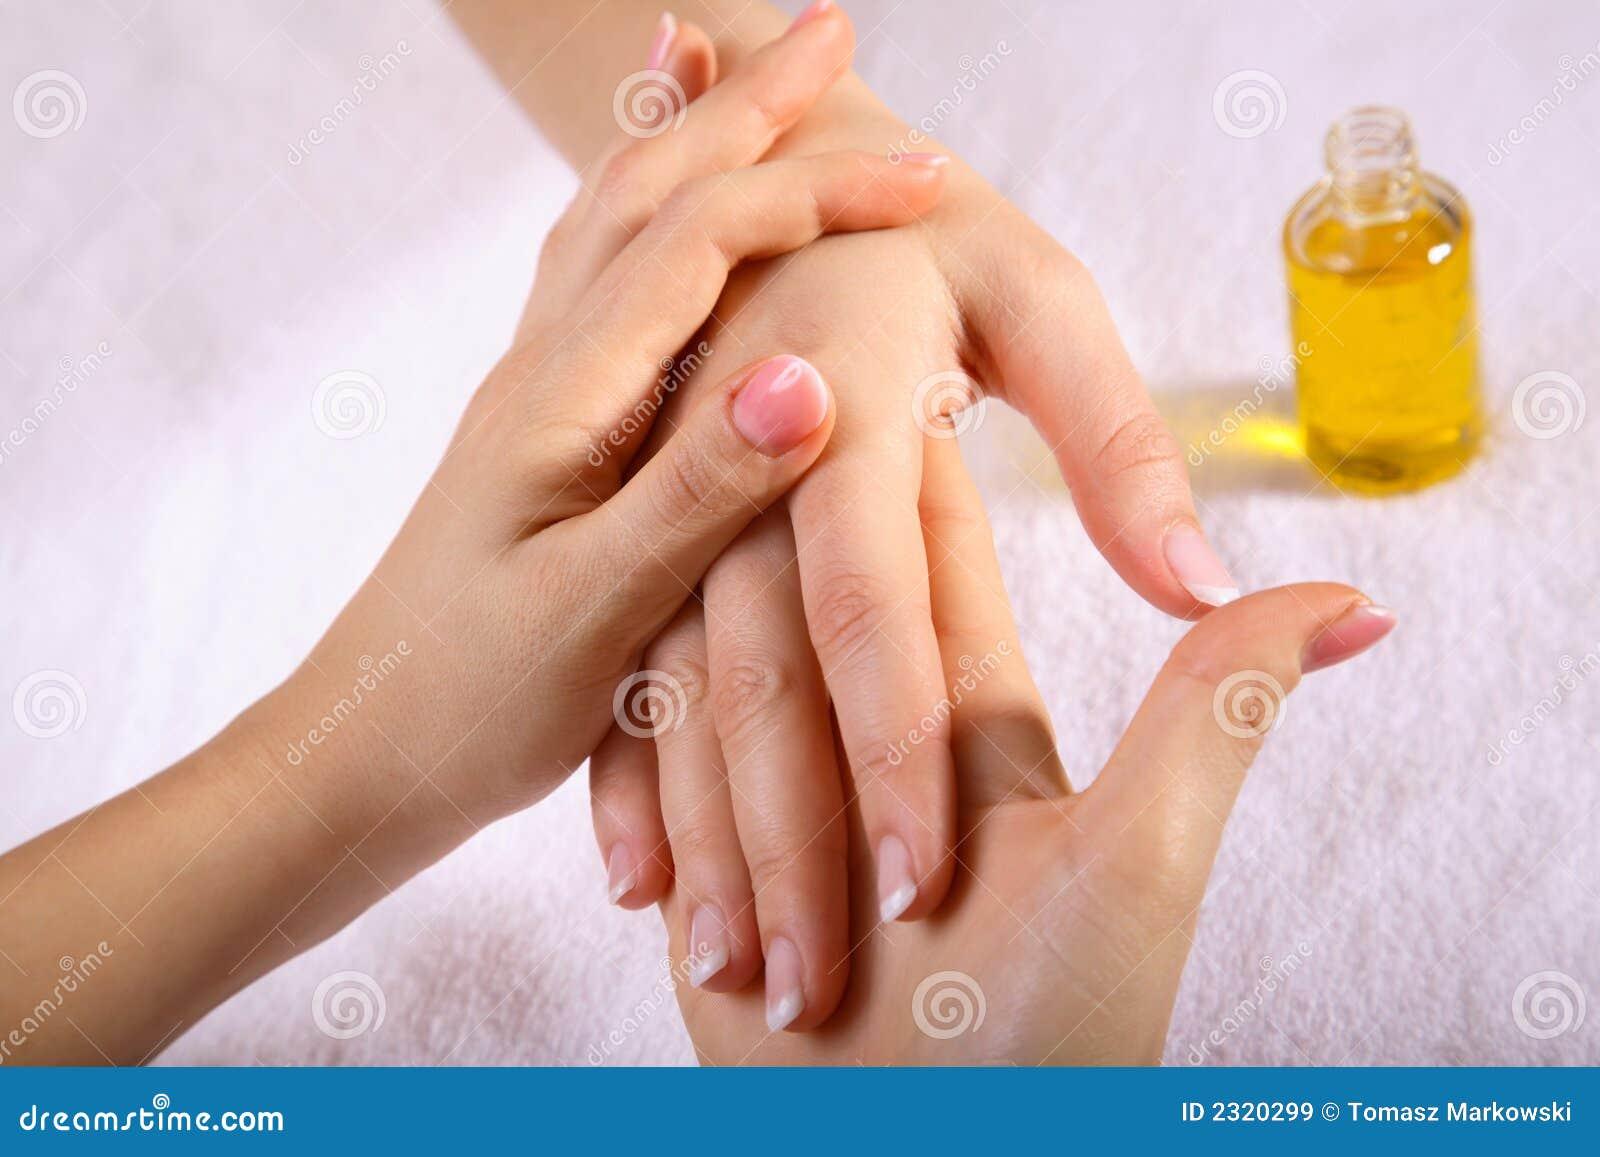 hand massage royalty free stock images   image 2320299